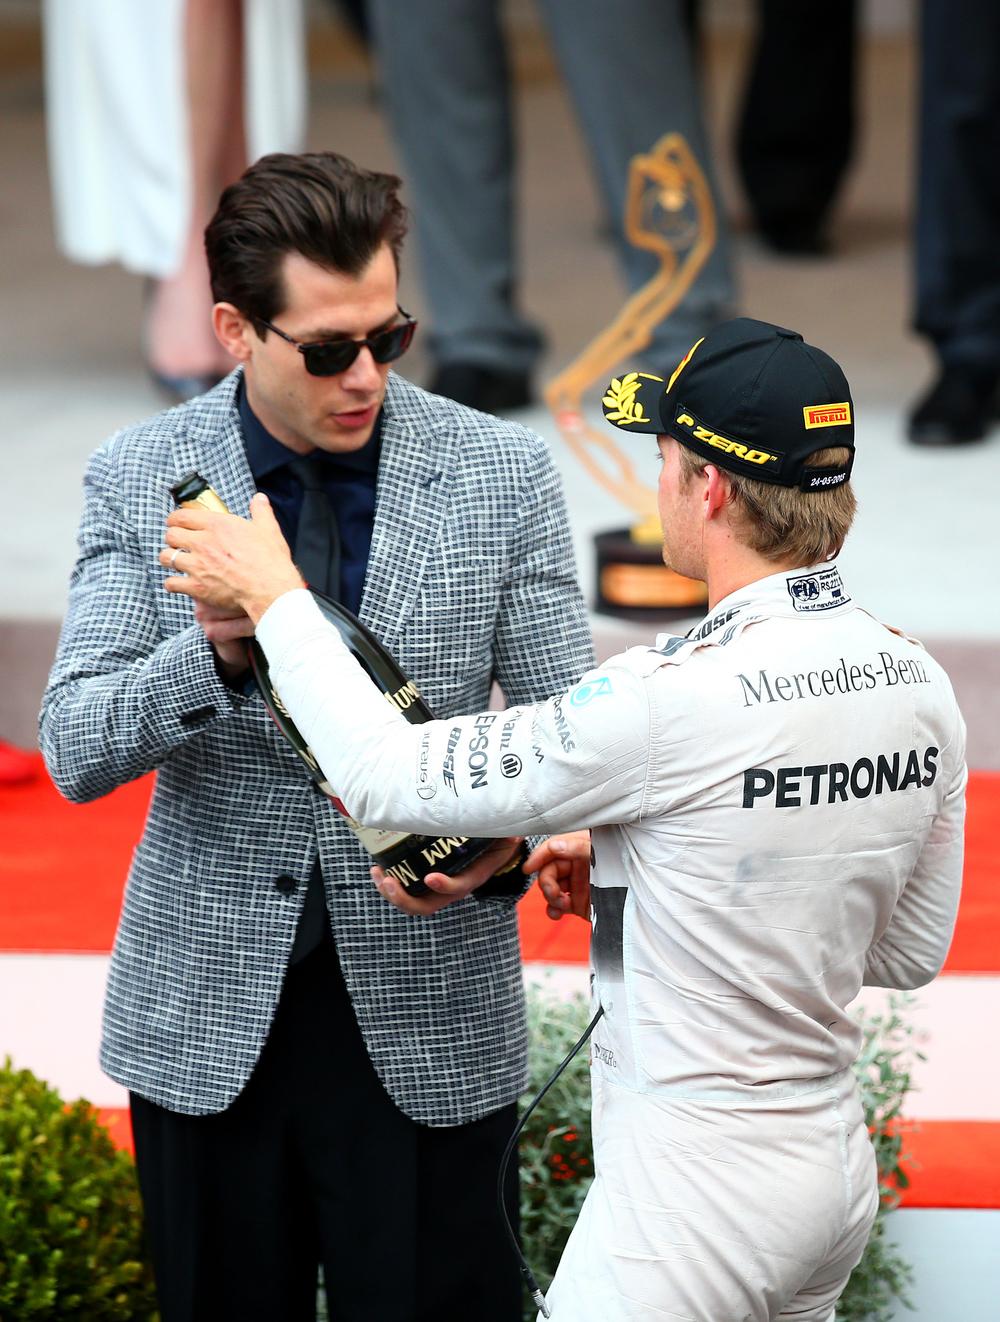 Jeroboam_Podium_celebration_Mark_Ronson_Nico_Rosberg.jpg